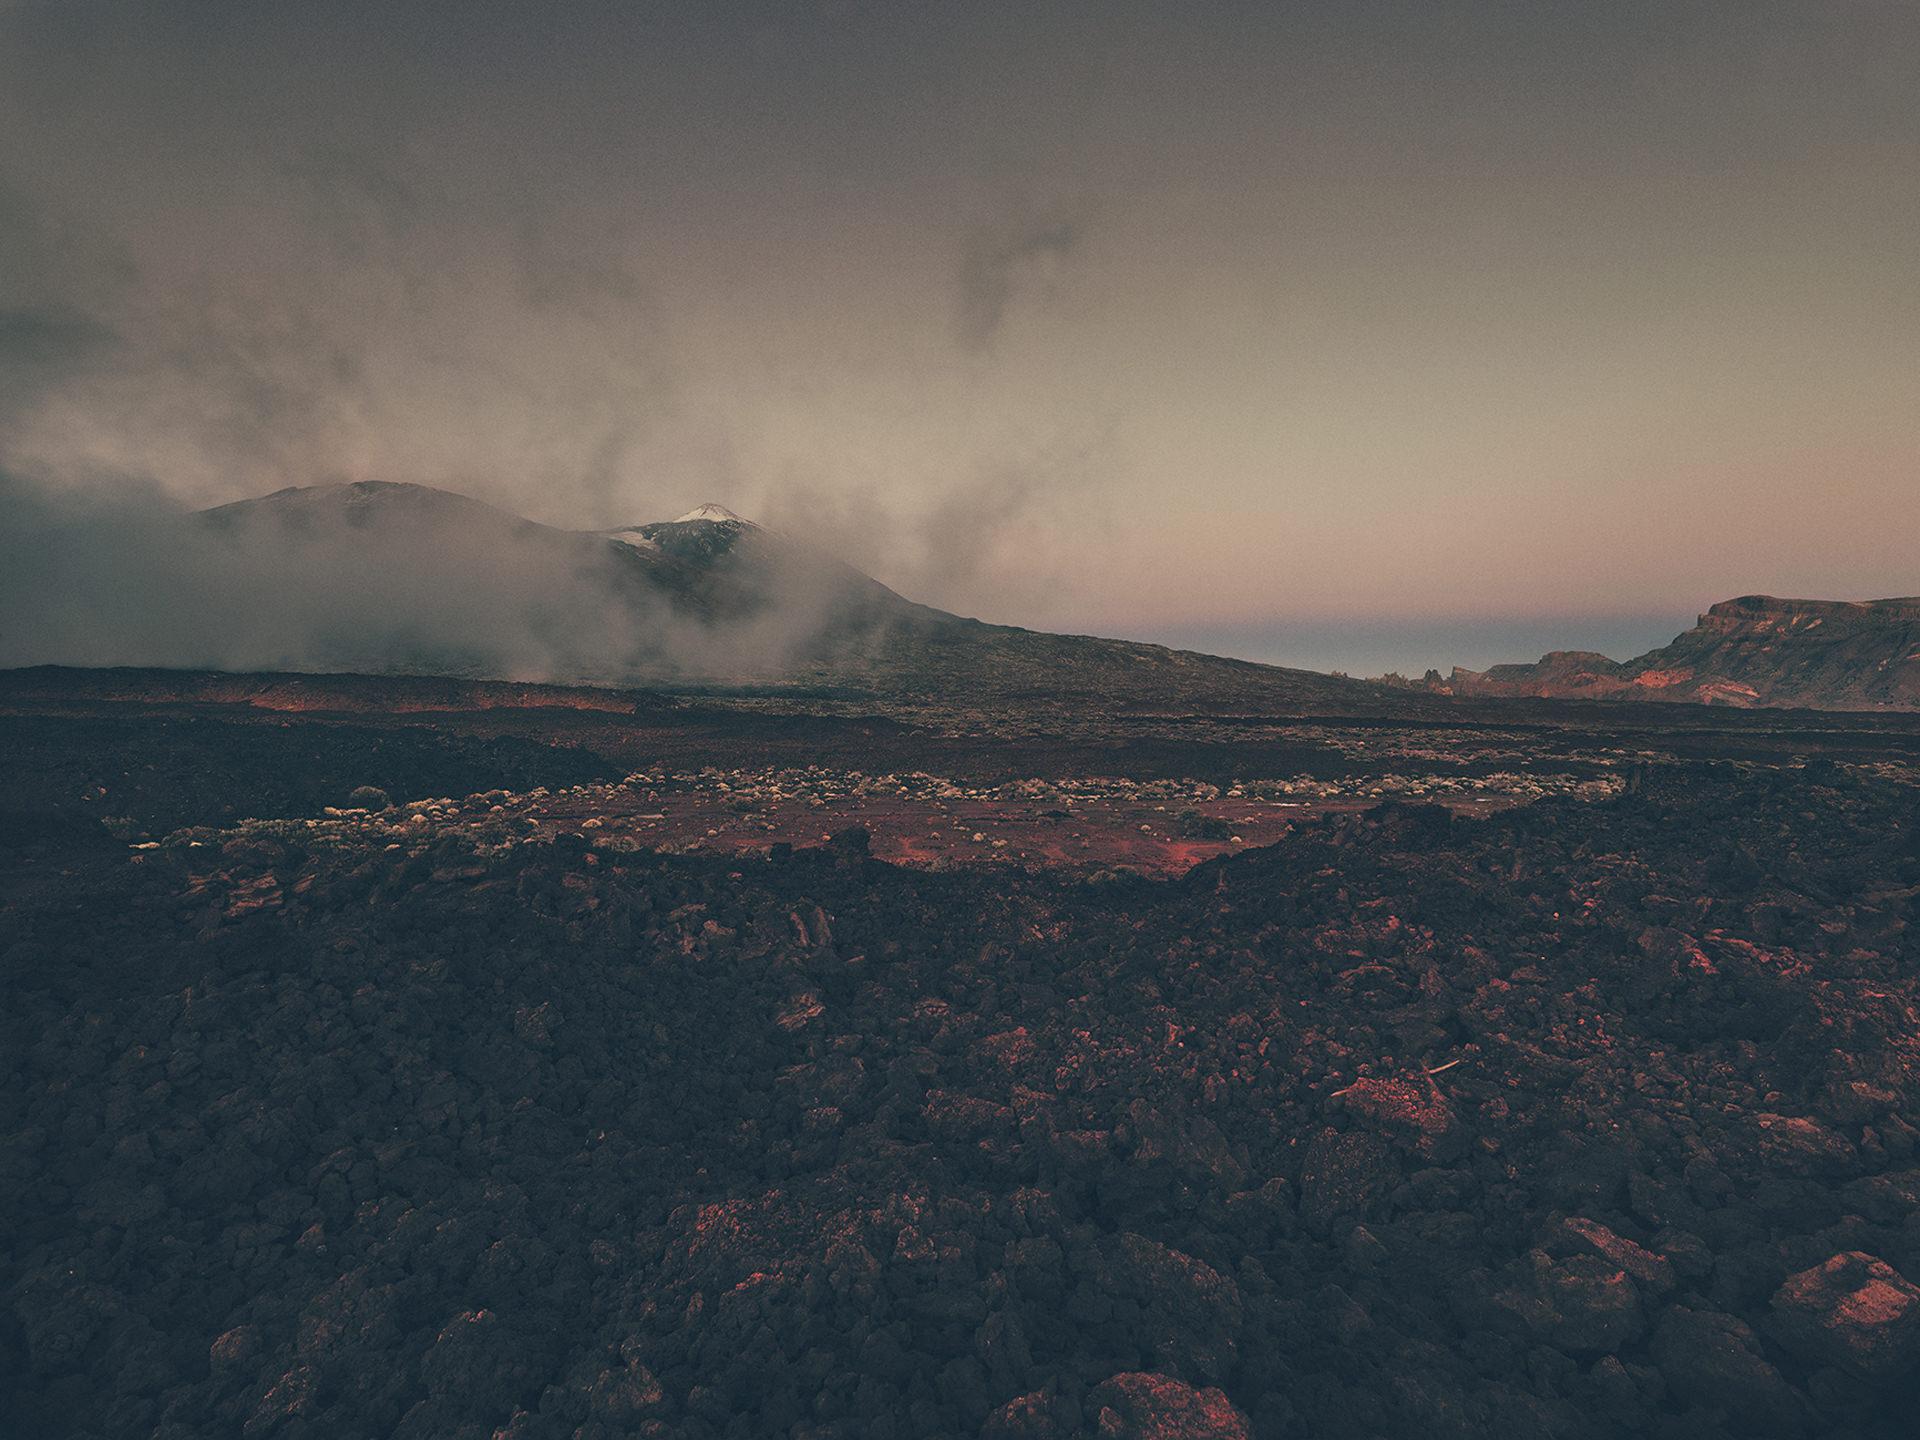 ©ankeluckmann1567, gosee awards, gold , anke luckmann, www.ankeluckmann.com, landscape, volcanic, trey, personal project